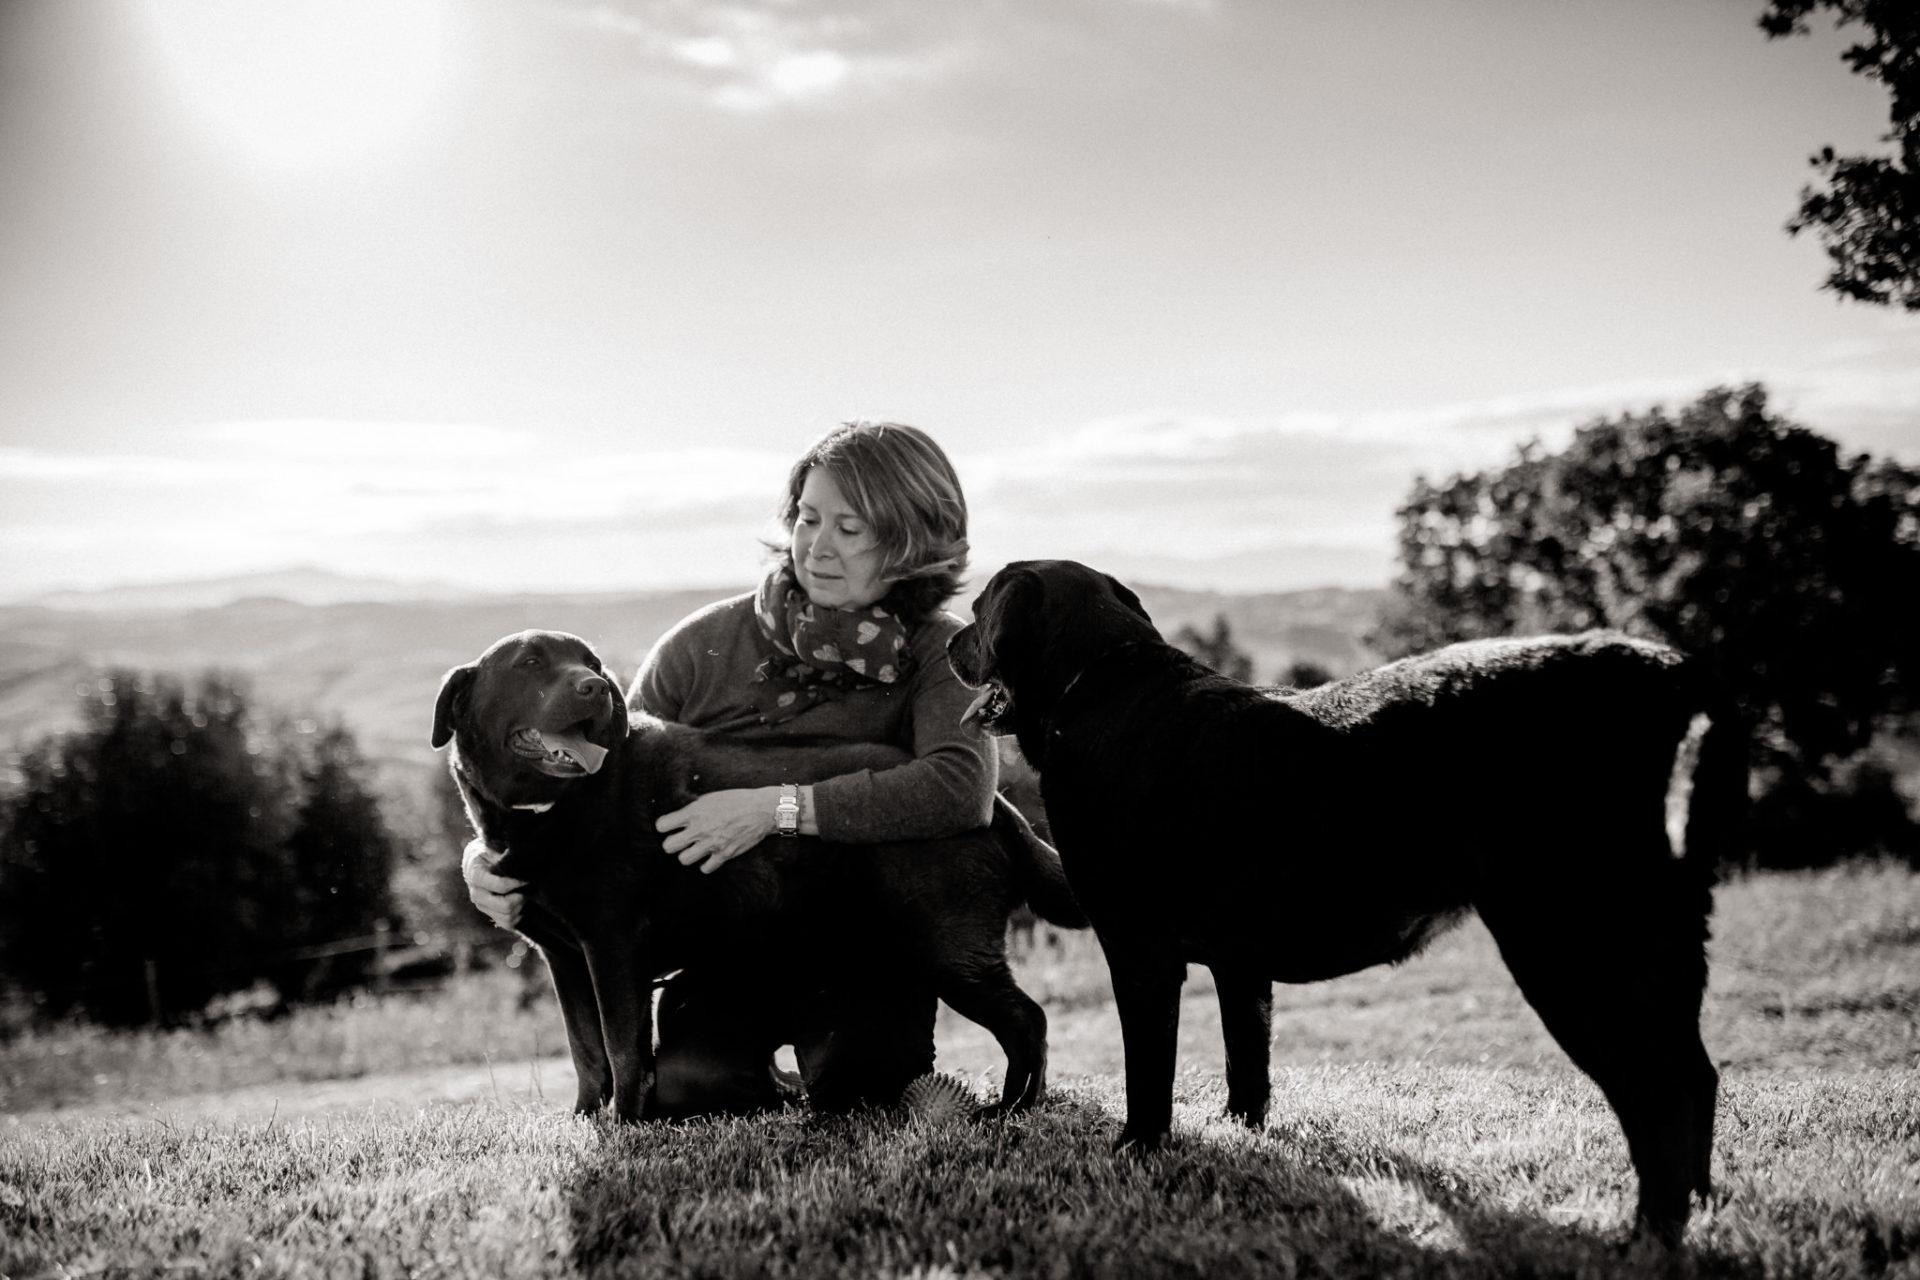 family photos holiday tuscany-labrador family dog-dimora santa margherita-travel italy-family portrait photographer stuttgart